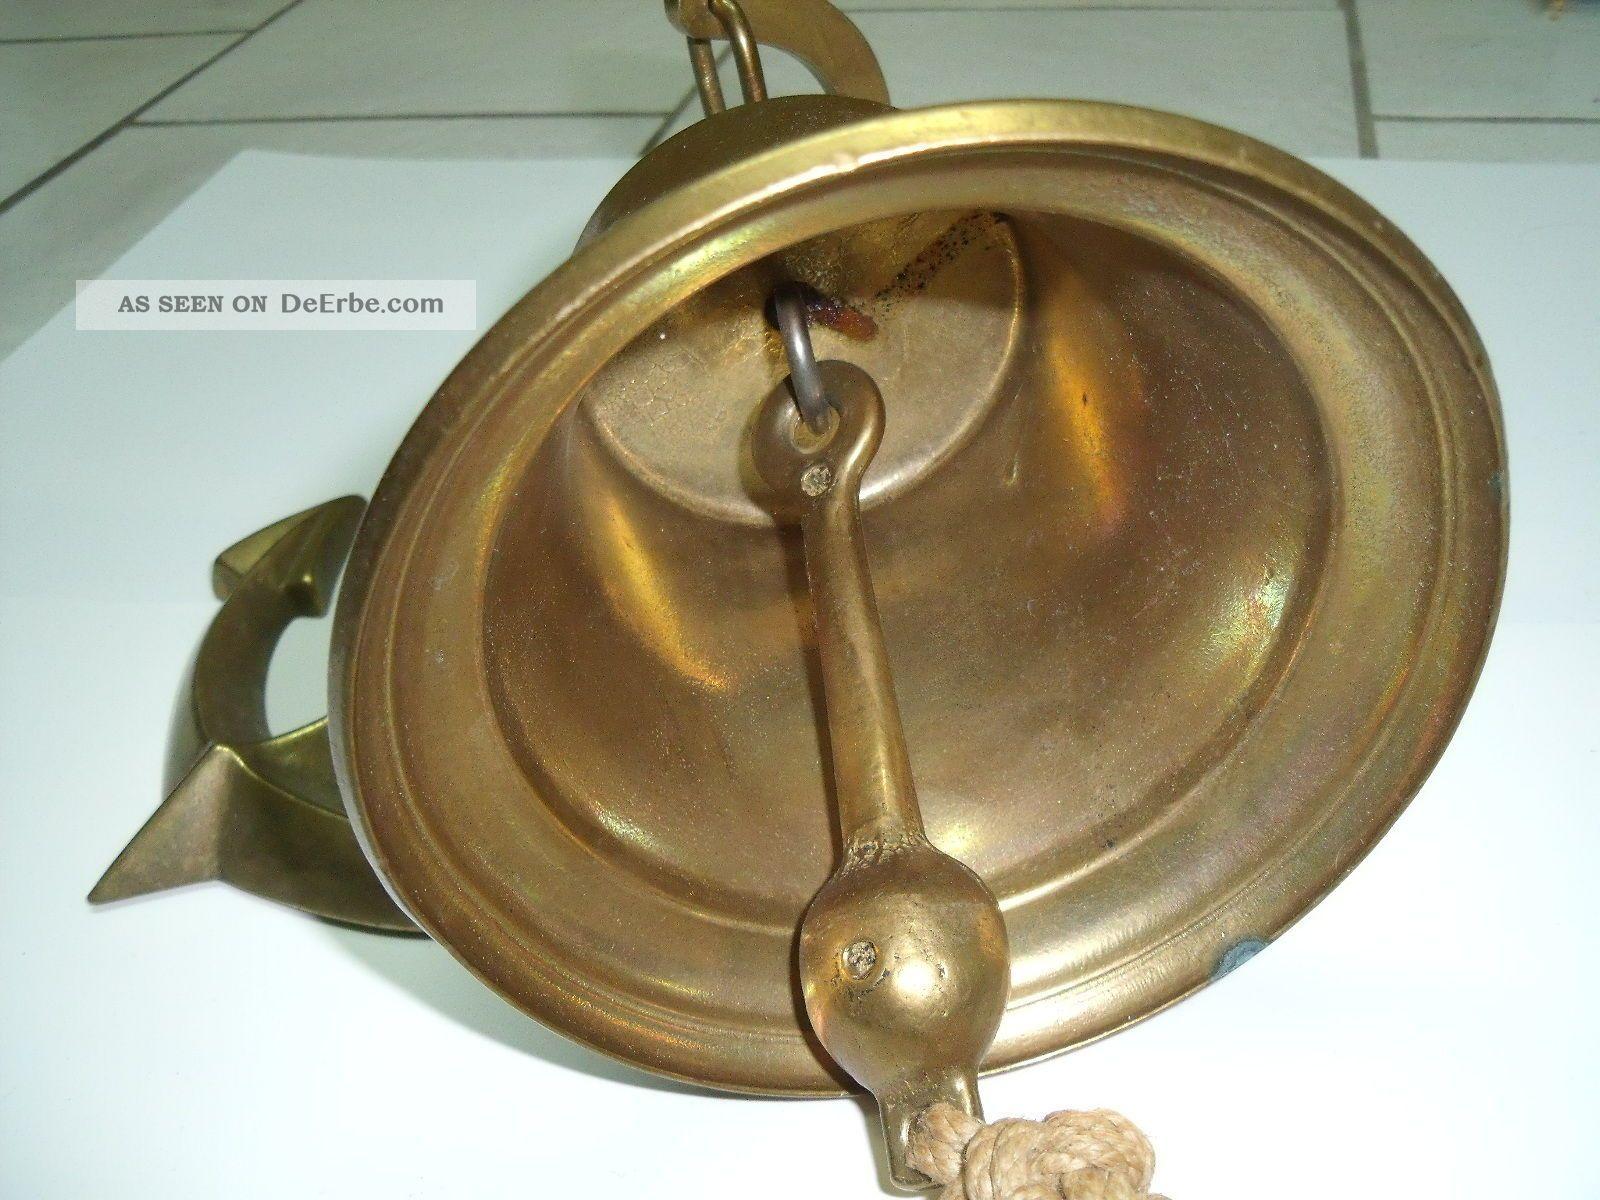 messing wandglocke schiffsglocke ms bremen 1911 glocke. Black Bedroom Furniture Sets. Home Design Ideas